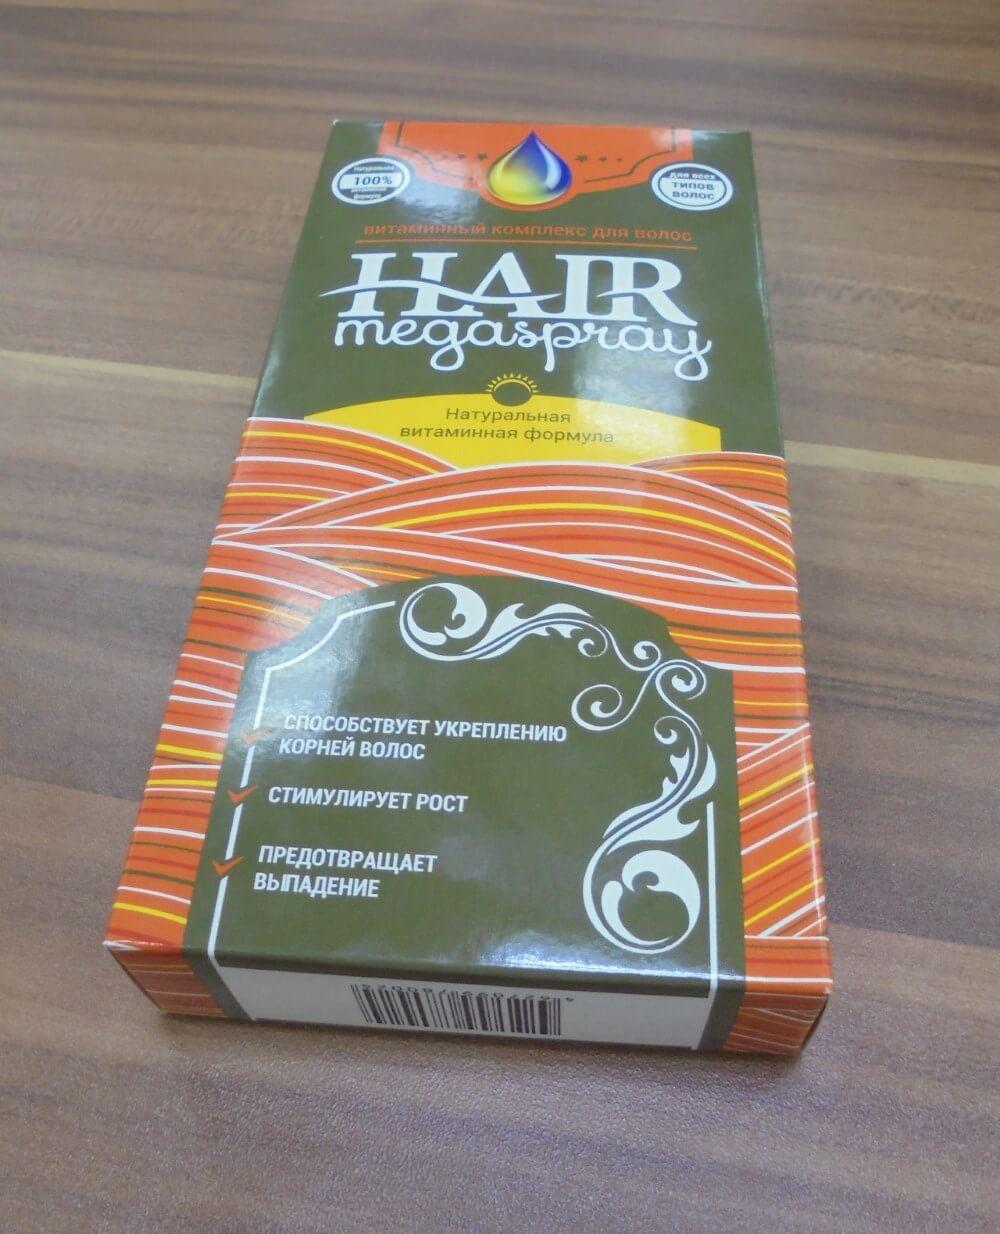 Цена спрей для волос hair megaspray отзывы